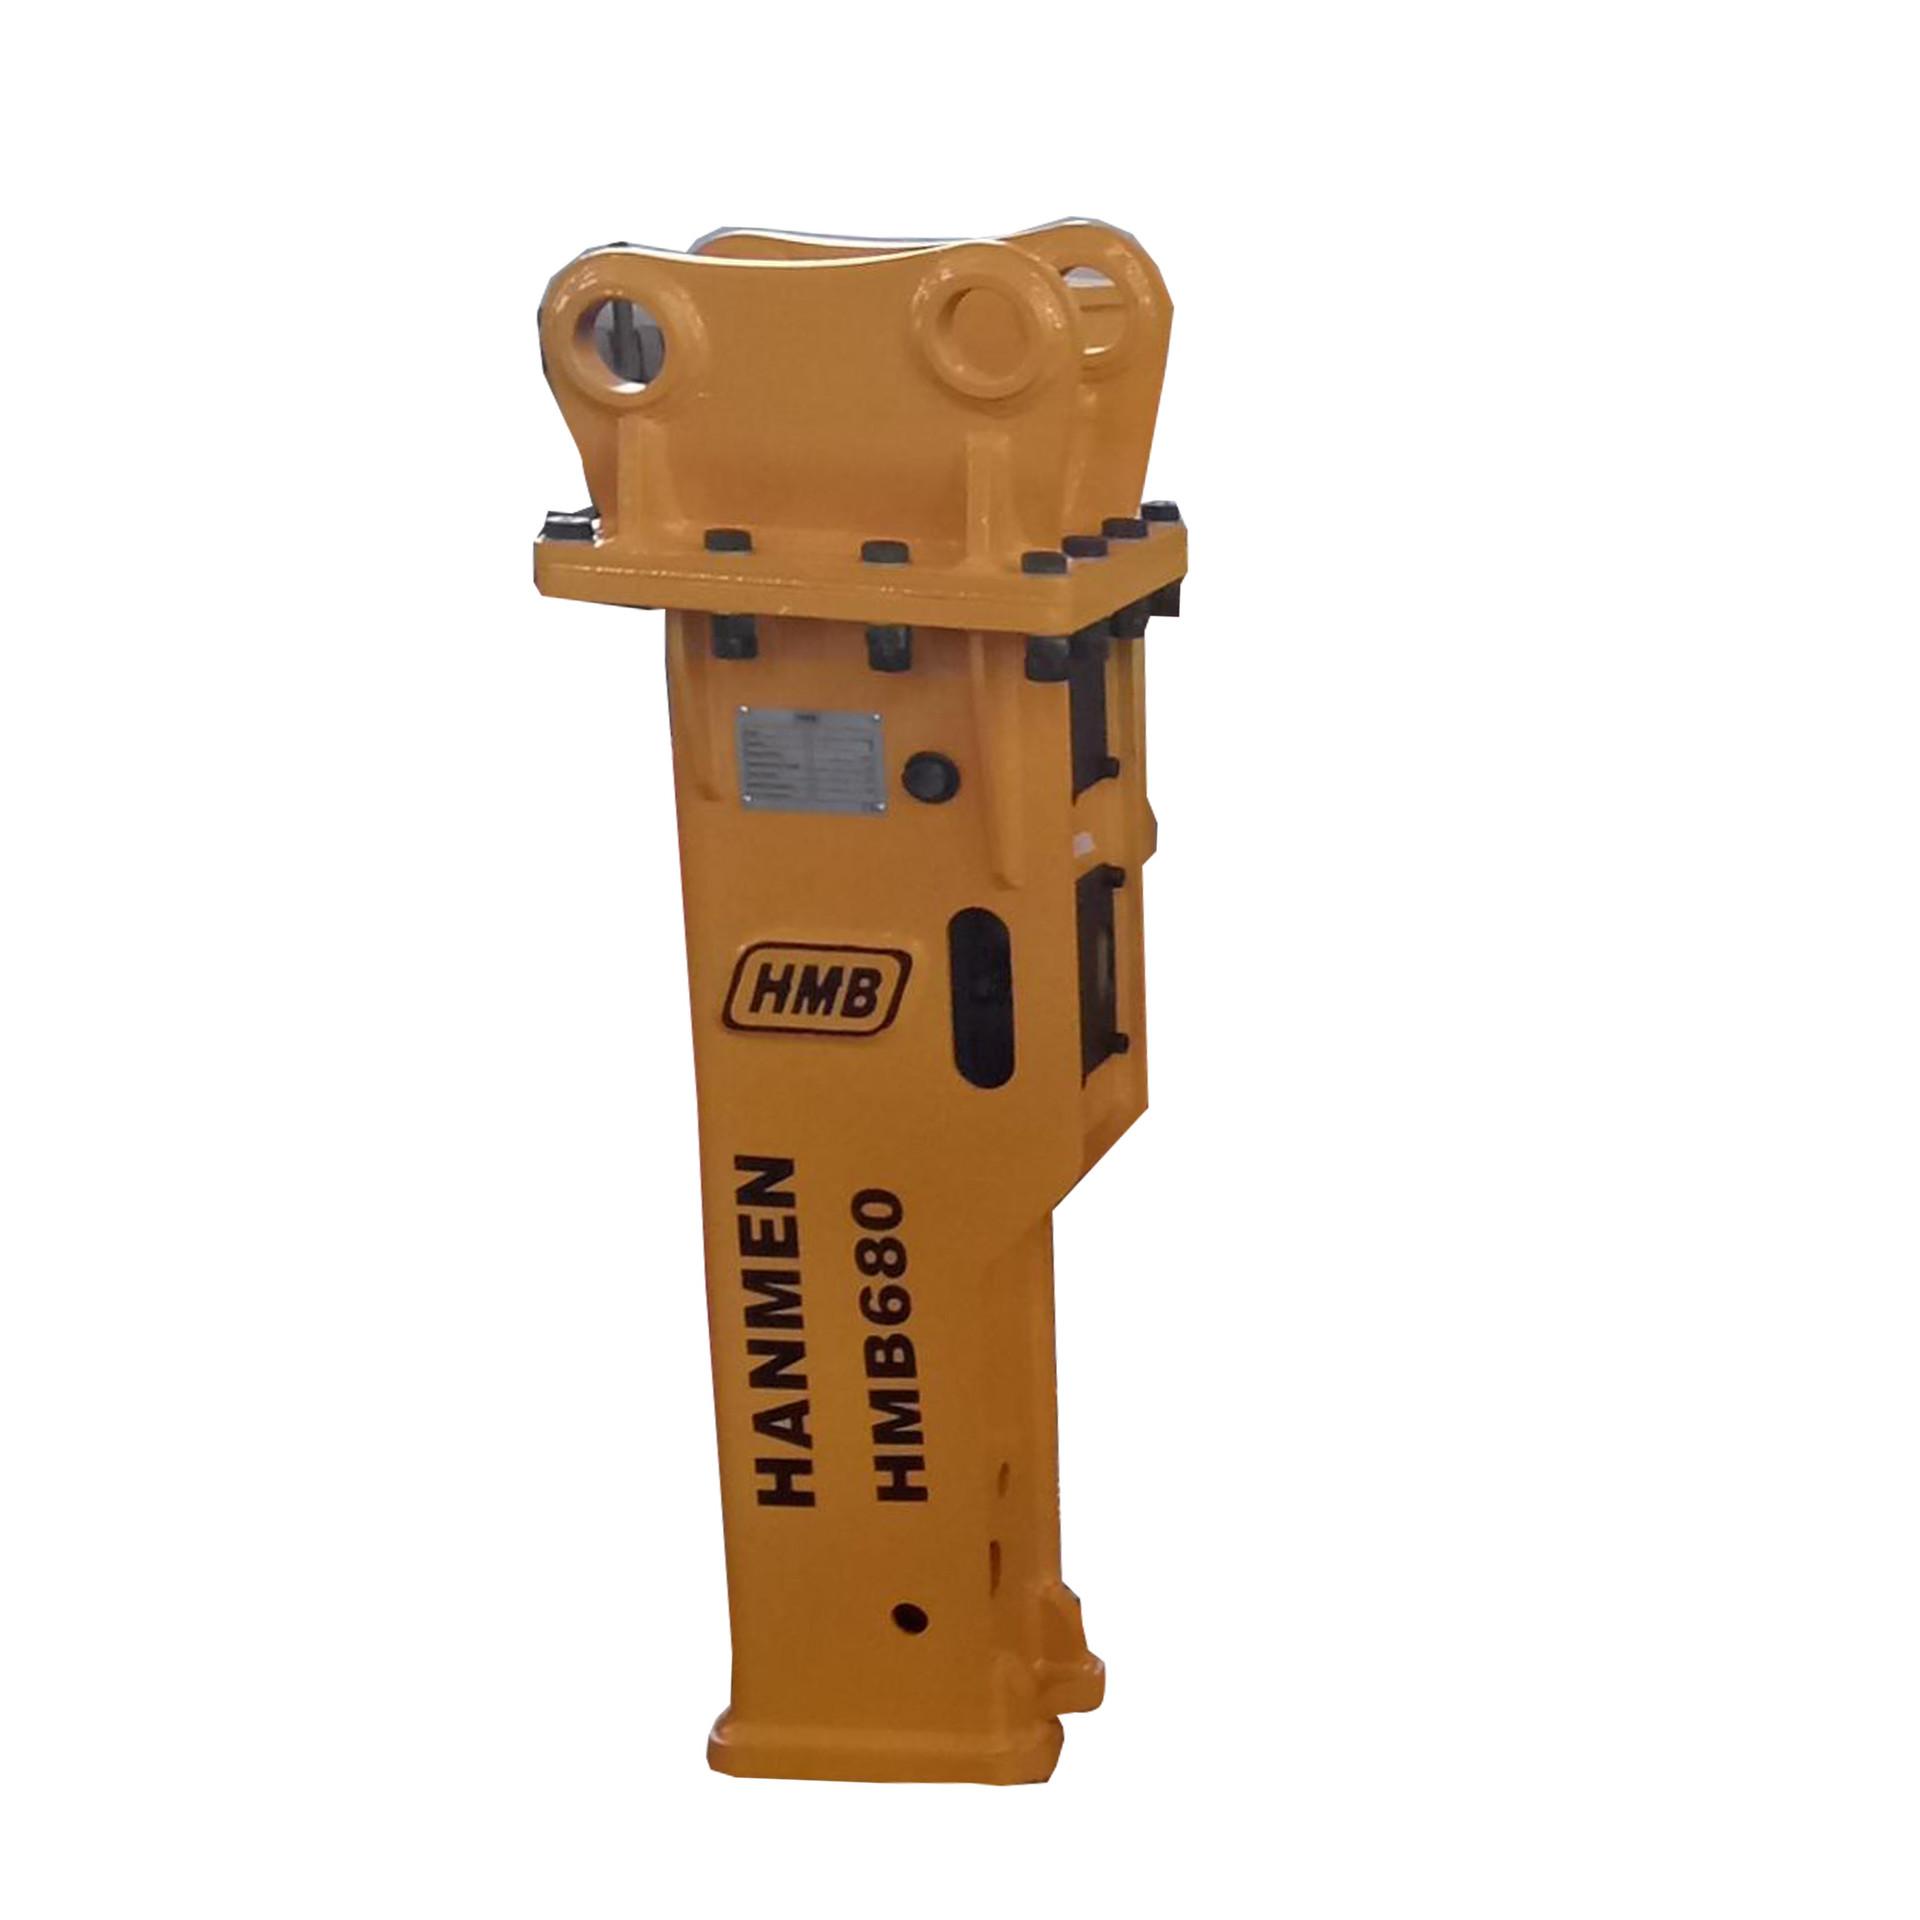 Excavator Hydraulic Hammer Manufacturers Hydraulic Rock Hammer Breaker sb40